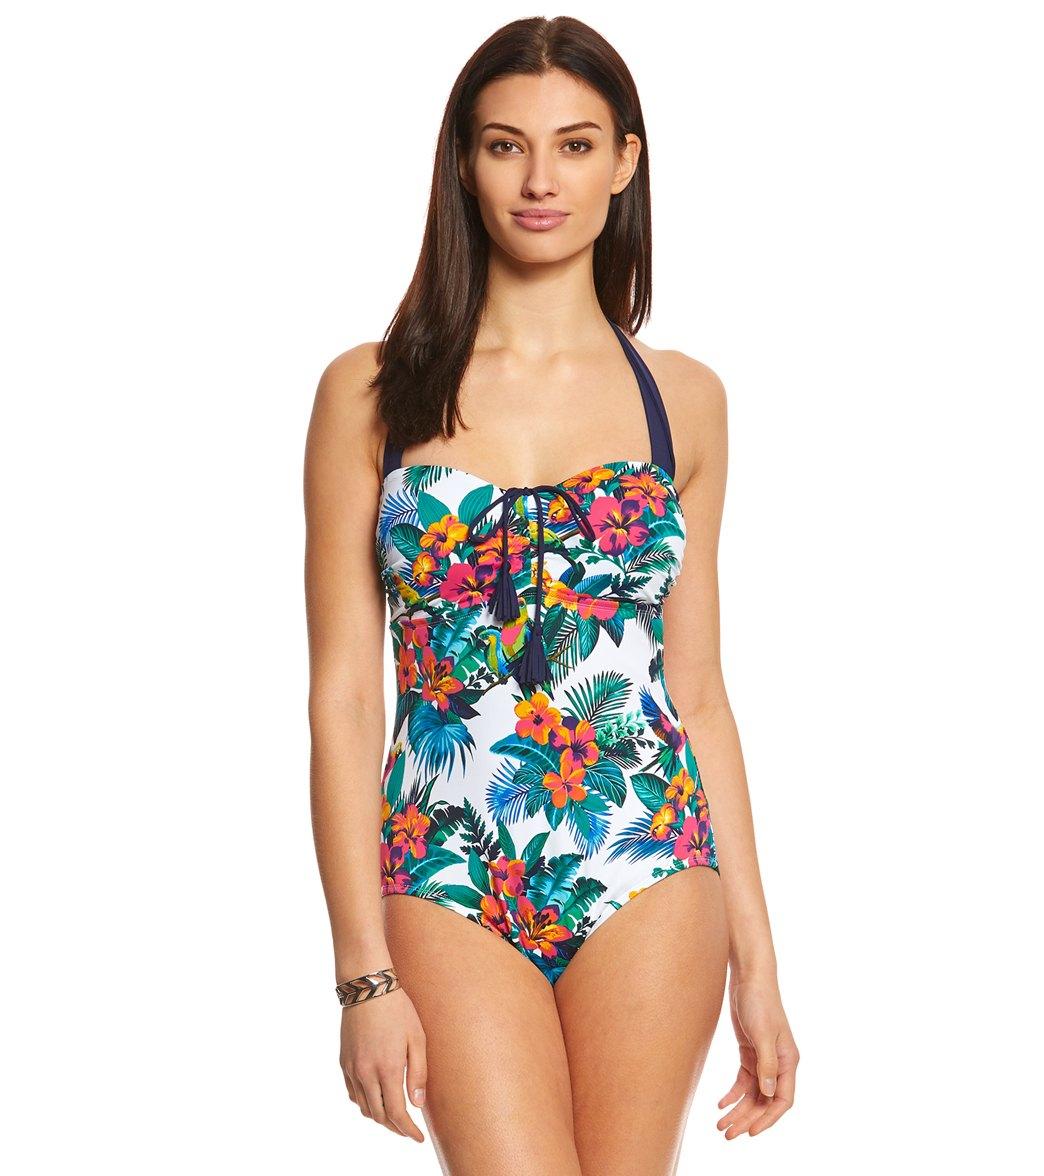 9eb17ce61ea3fc ... Tommy Bahama Jungle Flora Tie Front Halter One Piece Swimsuit. Play  Video. MODEL MEASUREMENTS